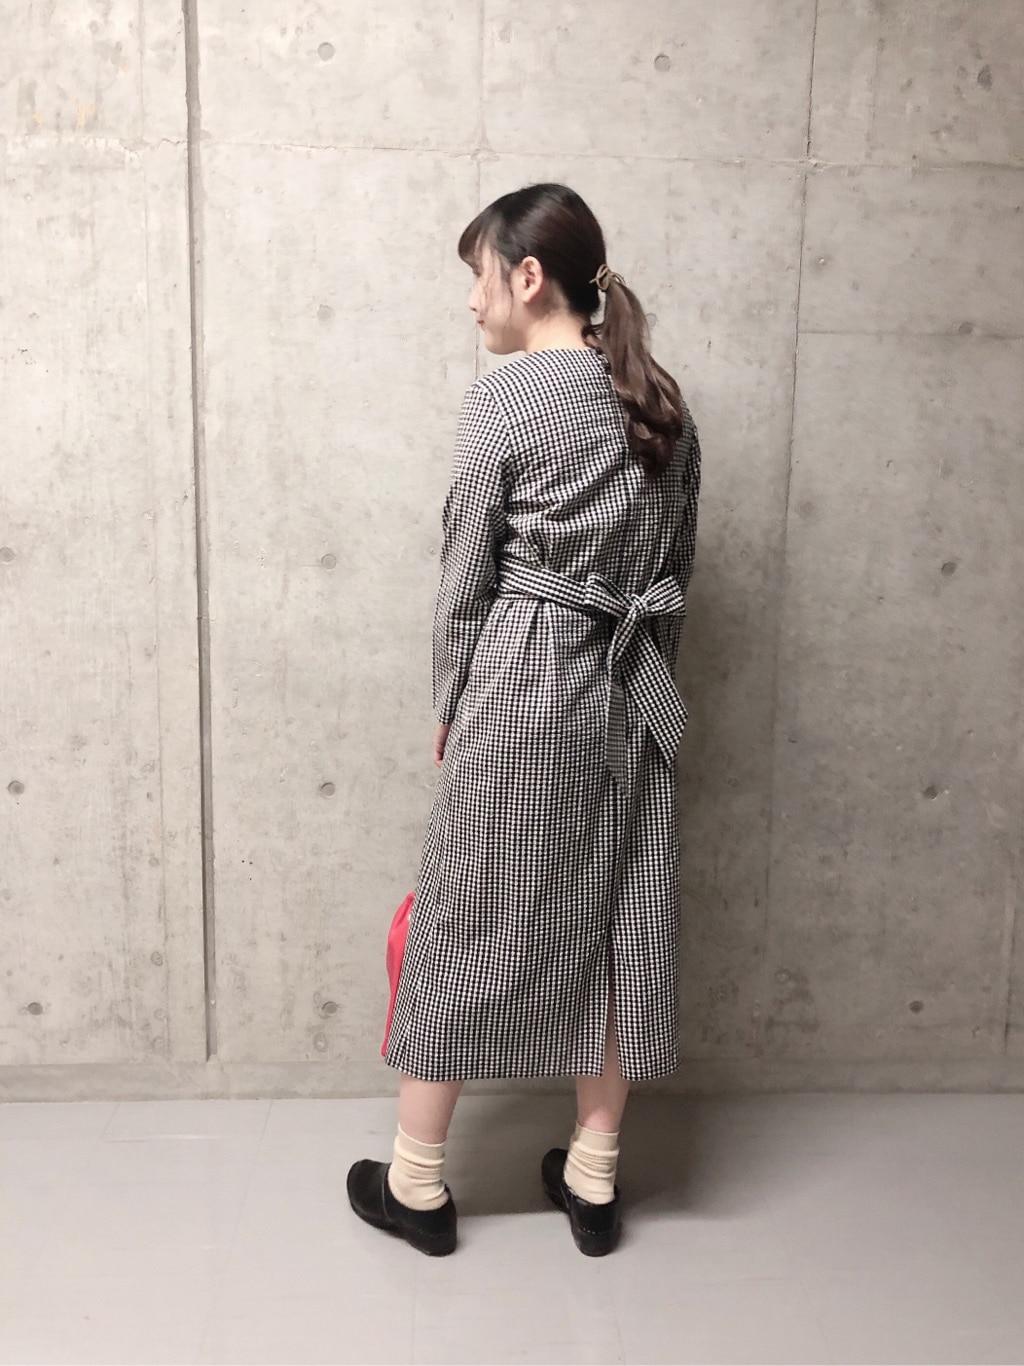 bulle de savon 阪急西宮ガーデンズ 身長:166cm 2020.02.27